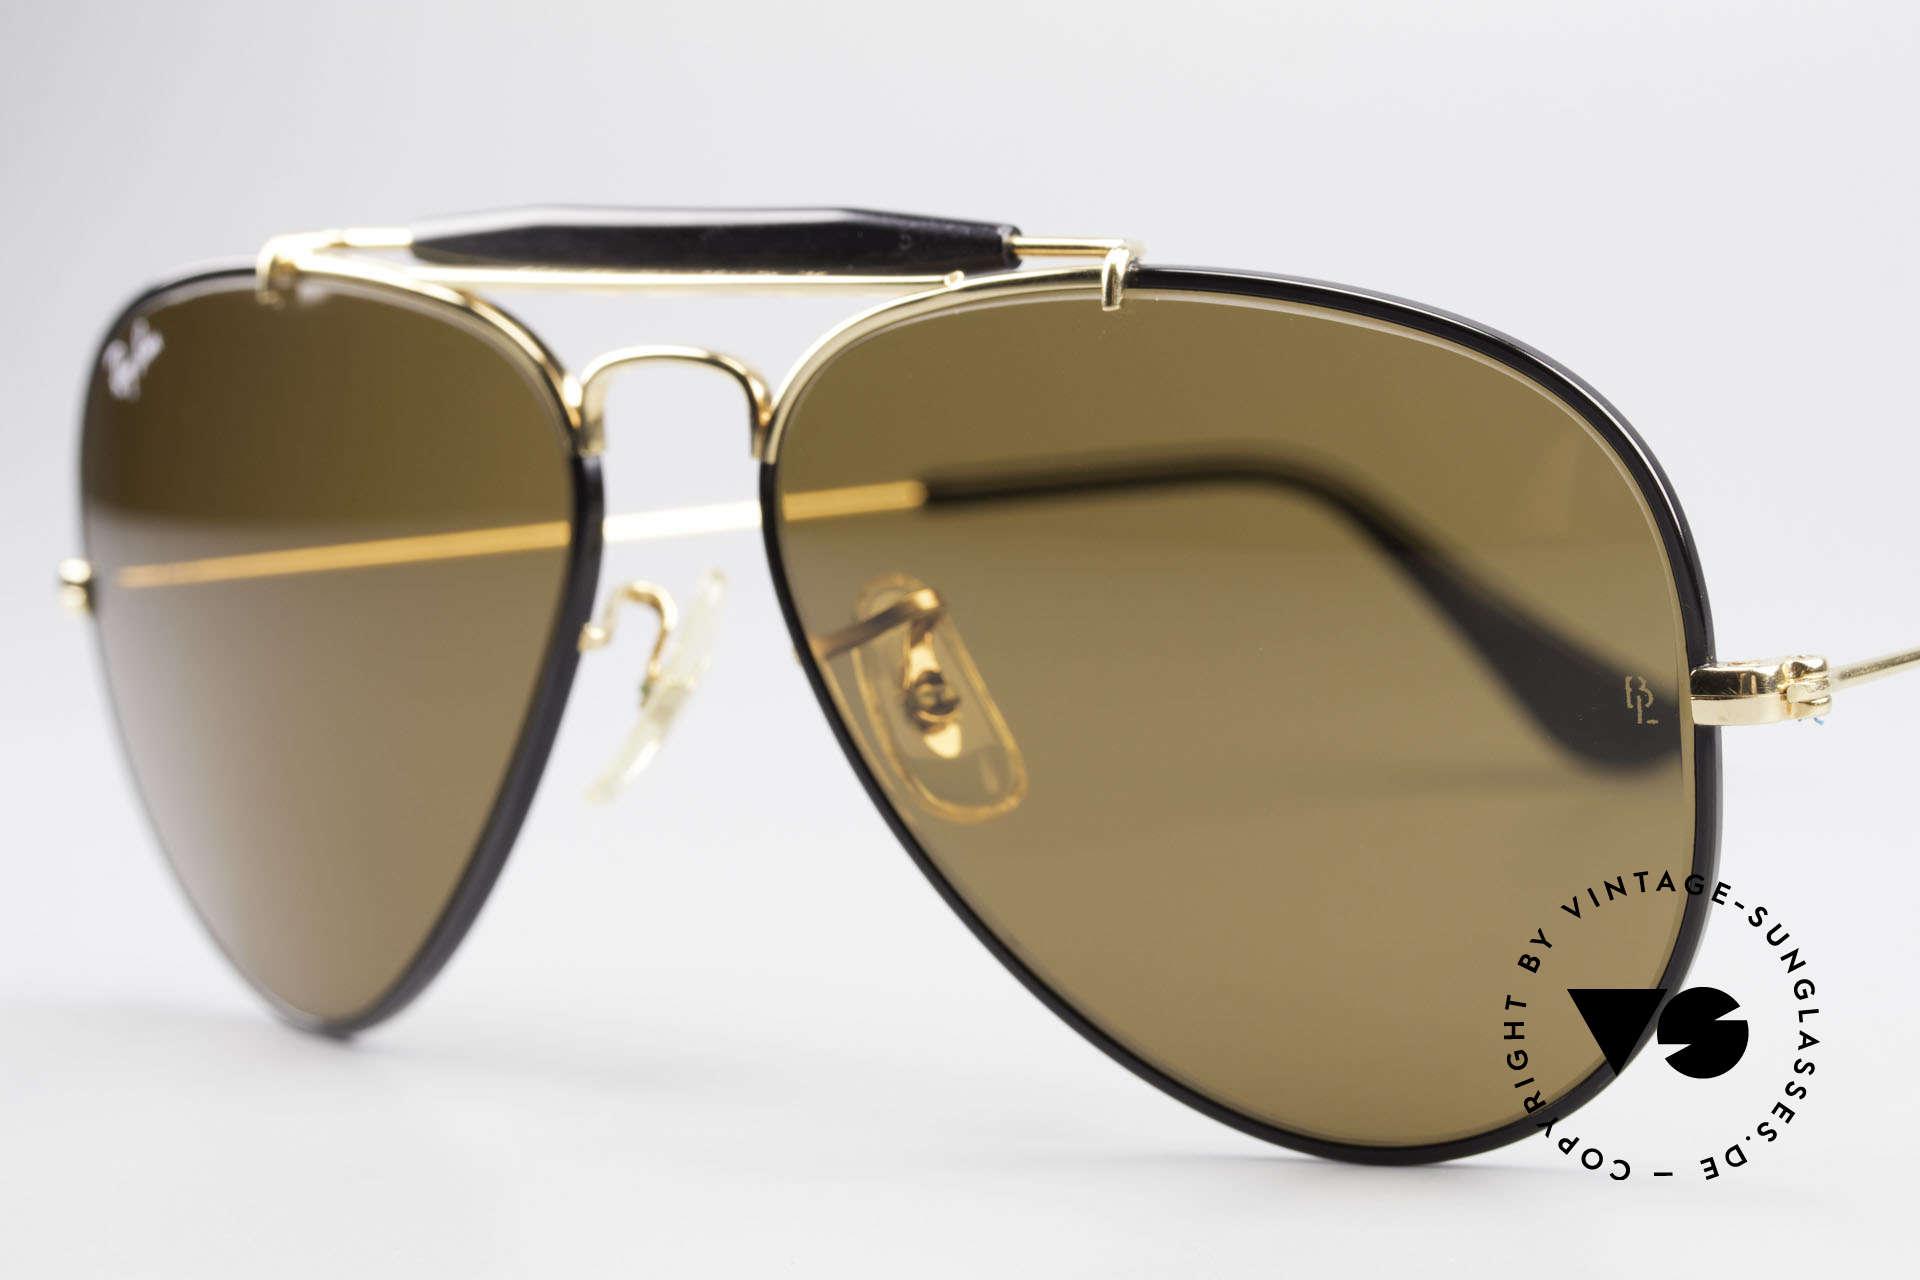 Ray Ban Outdoorsman Precious Metals Ray-Ban USA, Size: medium, Made for Men and Women